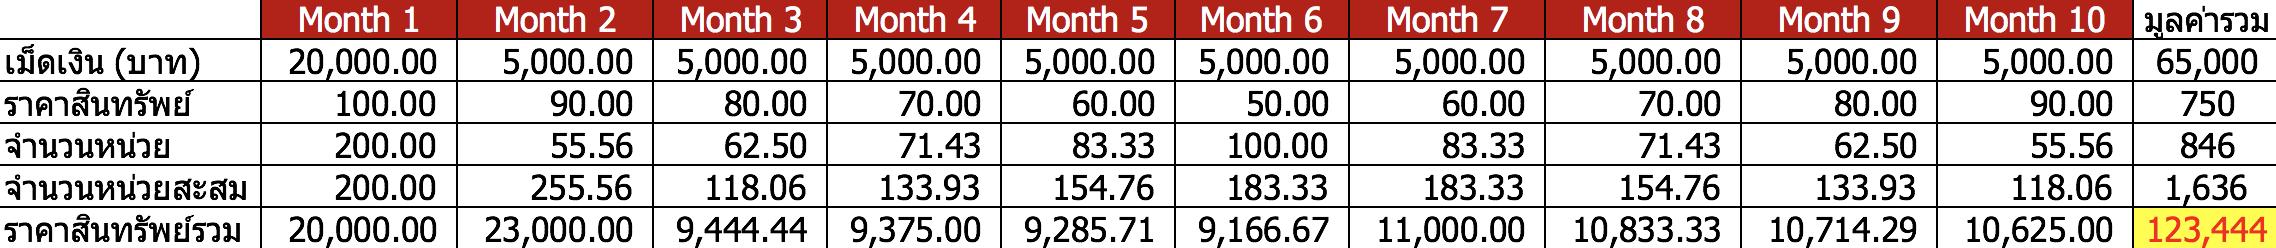 RUNNING for Growth: กลยุทธ์การลงทุนในภาวะตลาดขาลง (มีนาคม 2020)